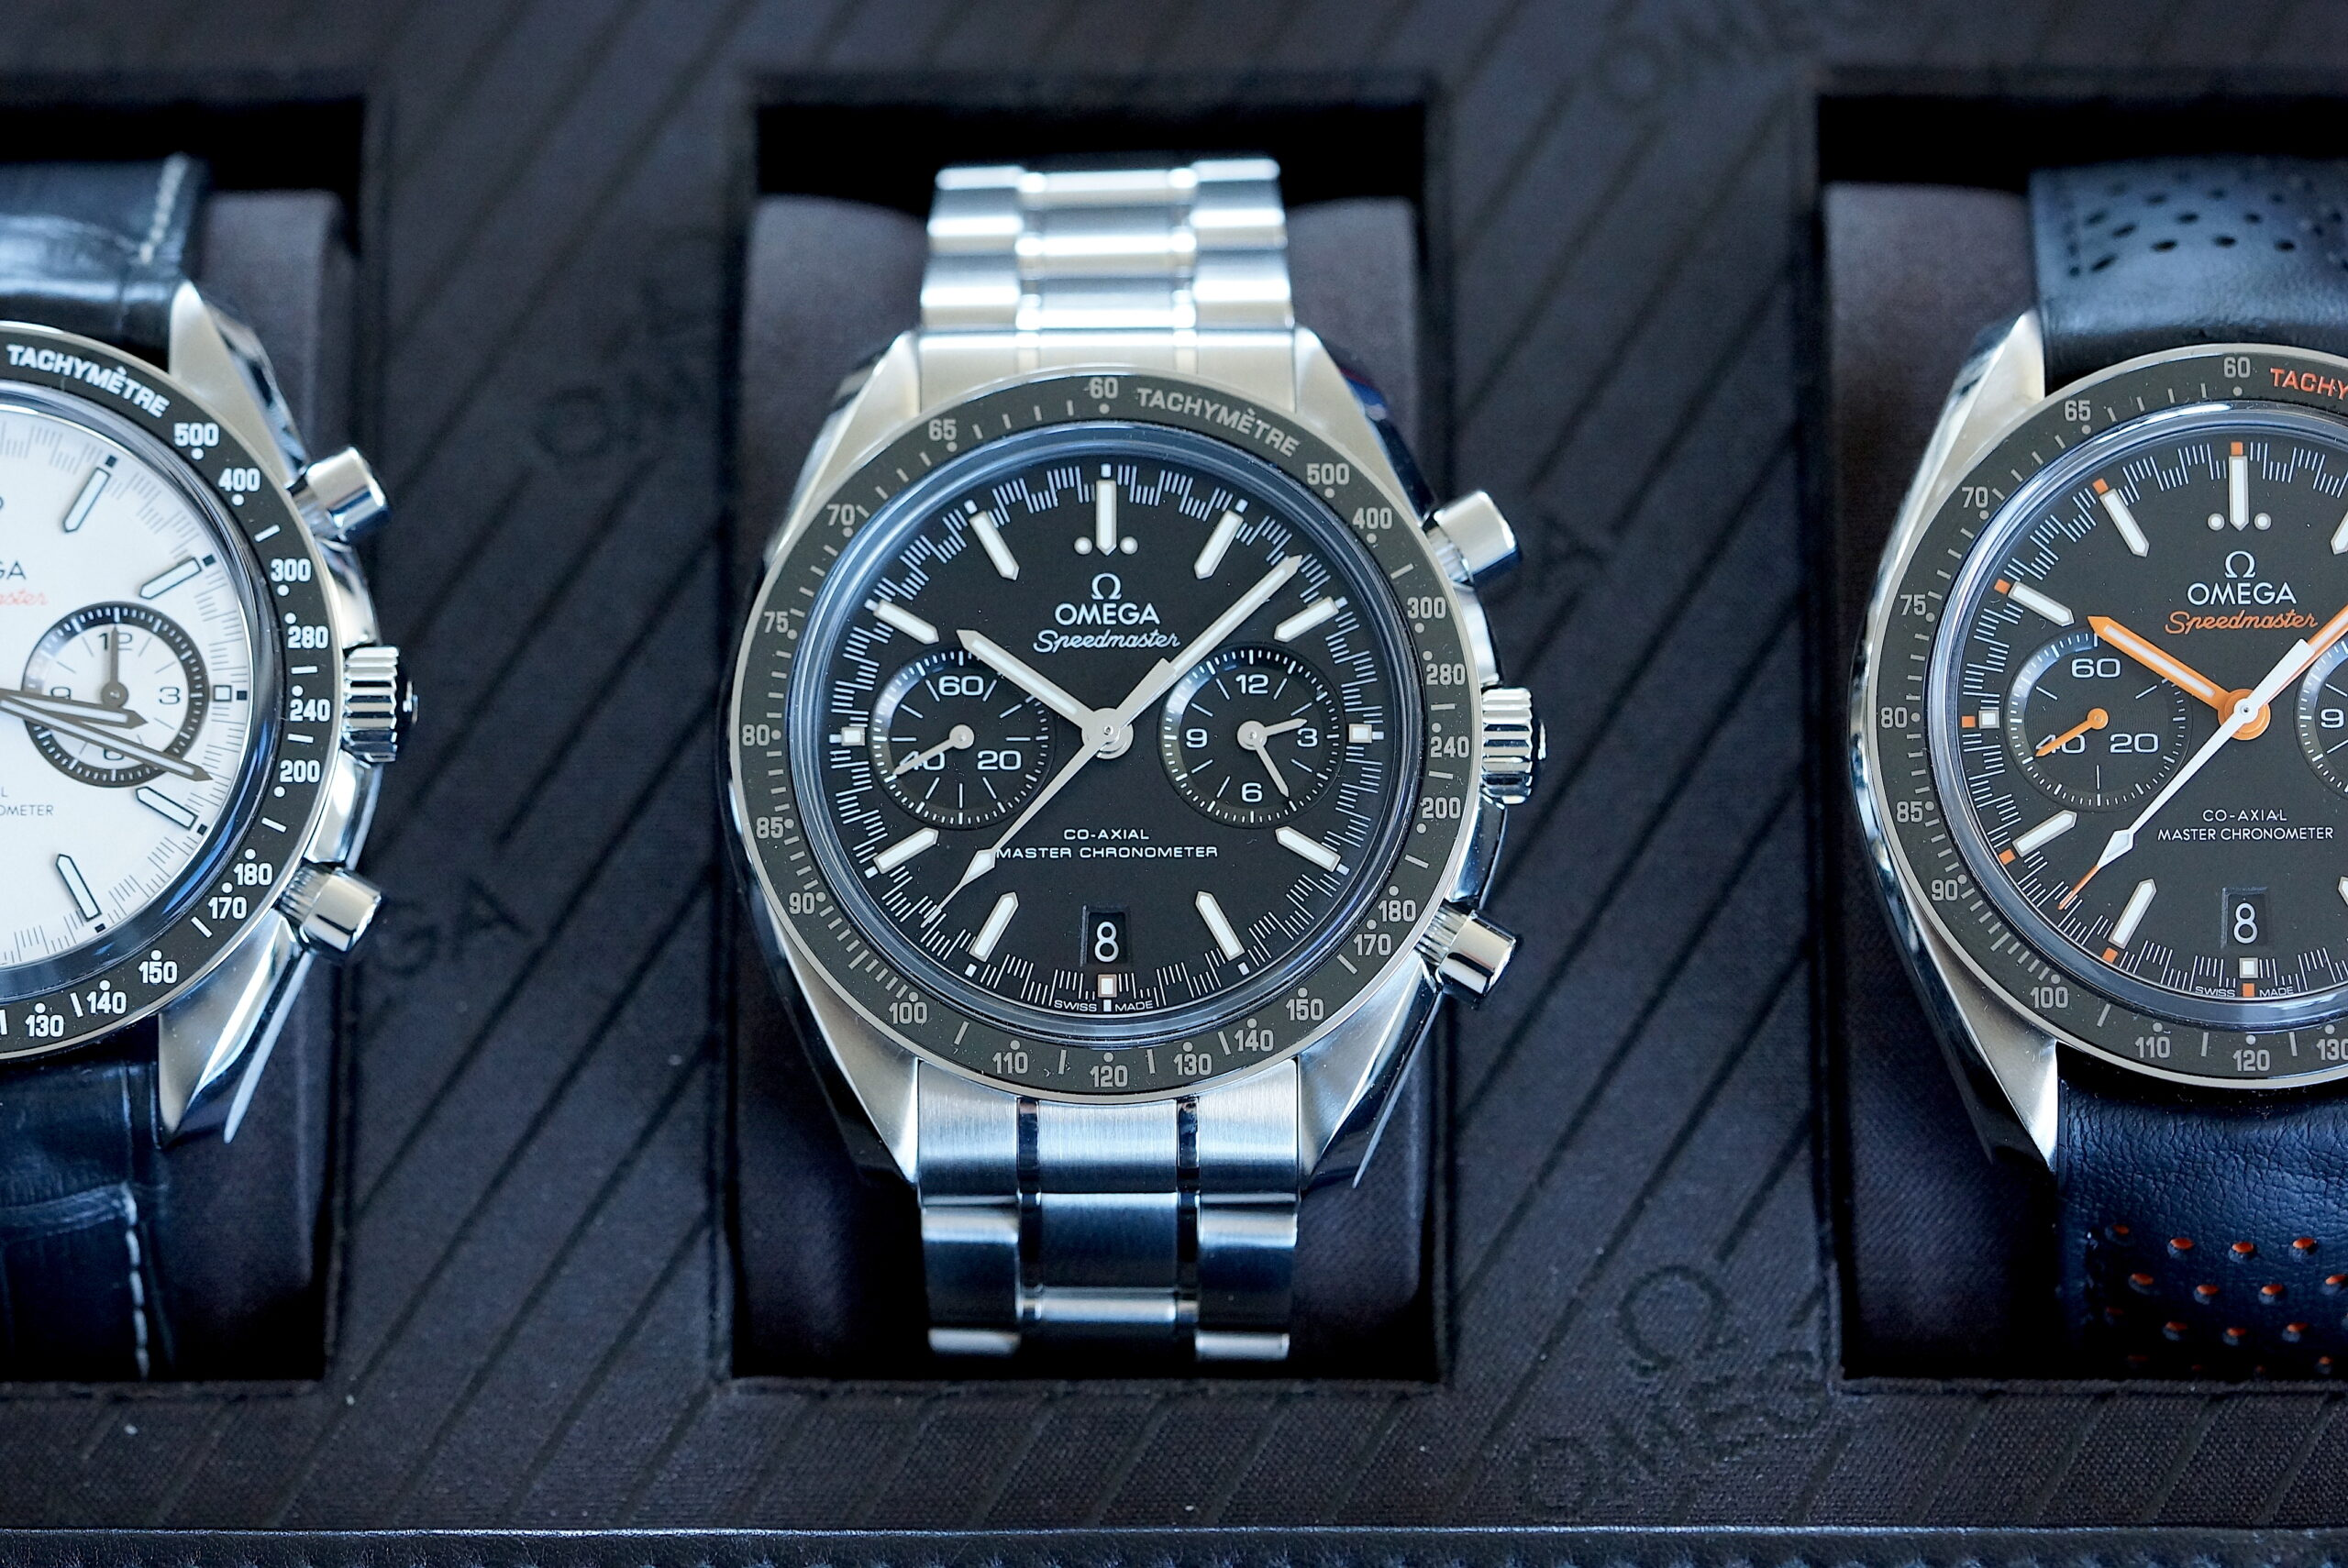 Omega Speedmaster Racing Co-Axial Master Chronometer